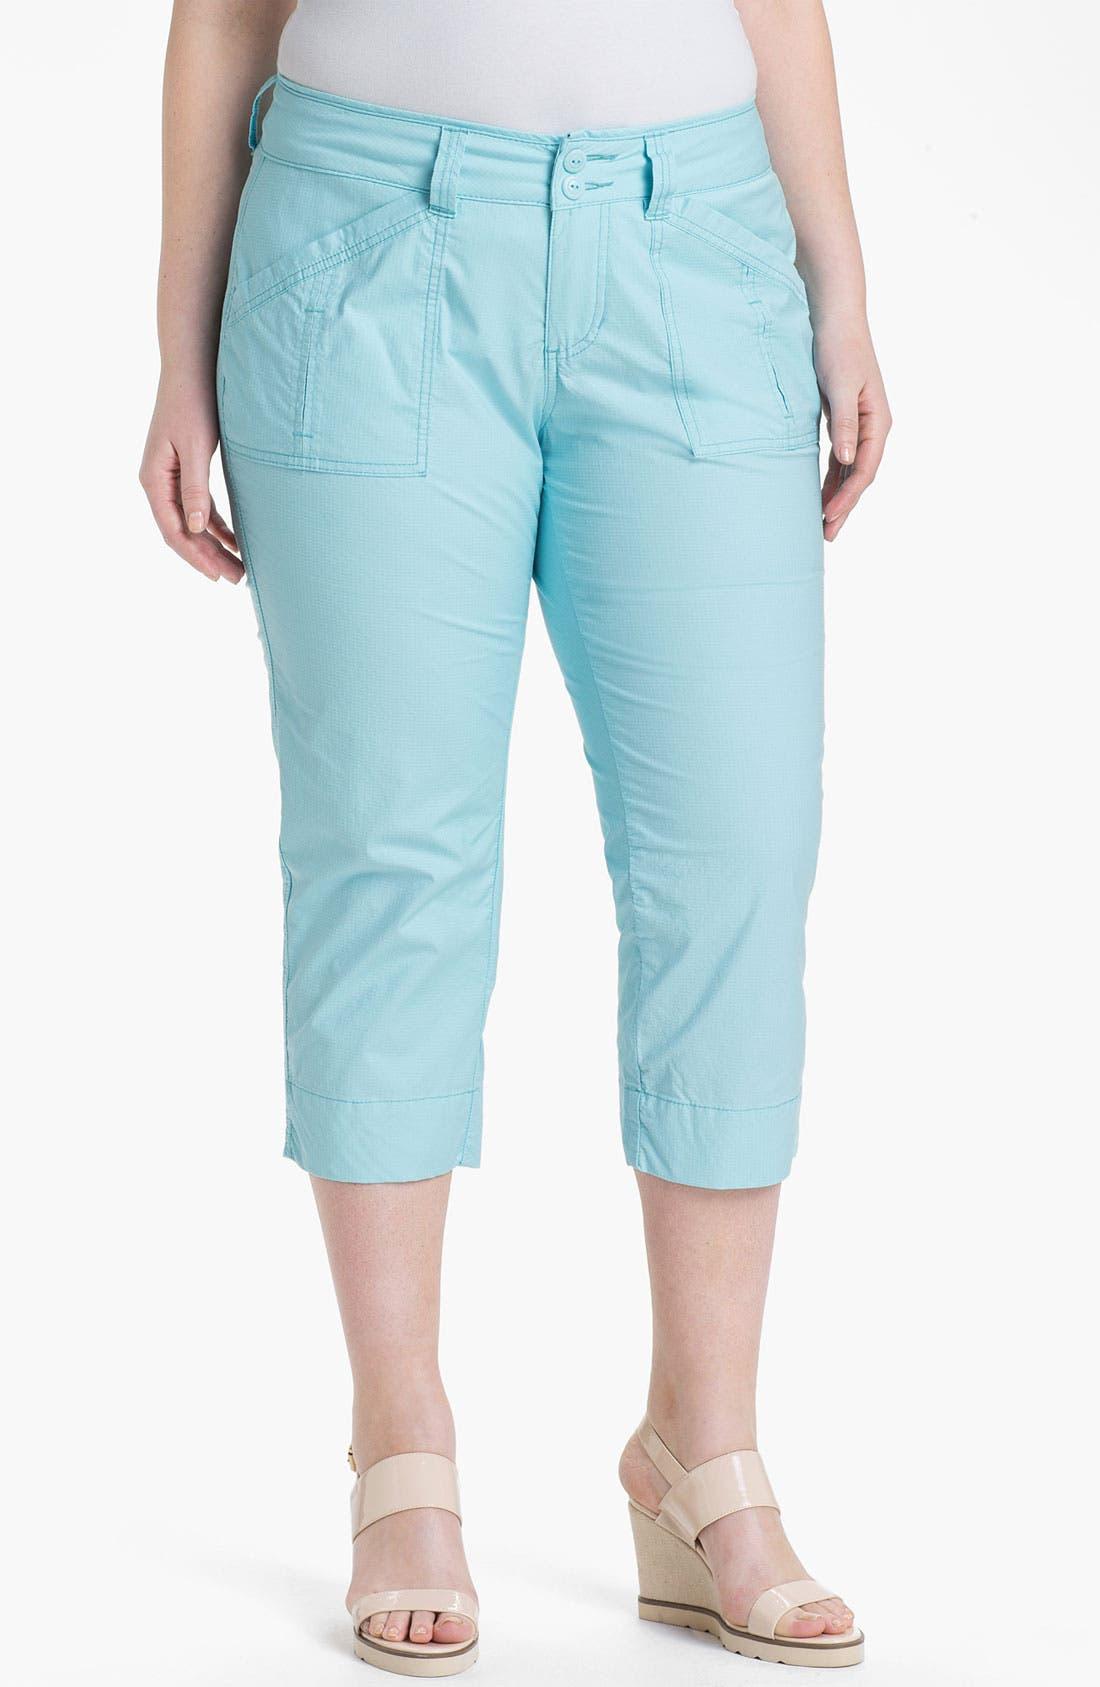 Alternate Image 1 Selected - Jag Jeans 'Ennis' Crop Ripstop Pants (Plus Size)